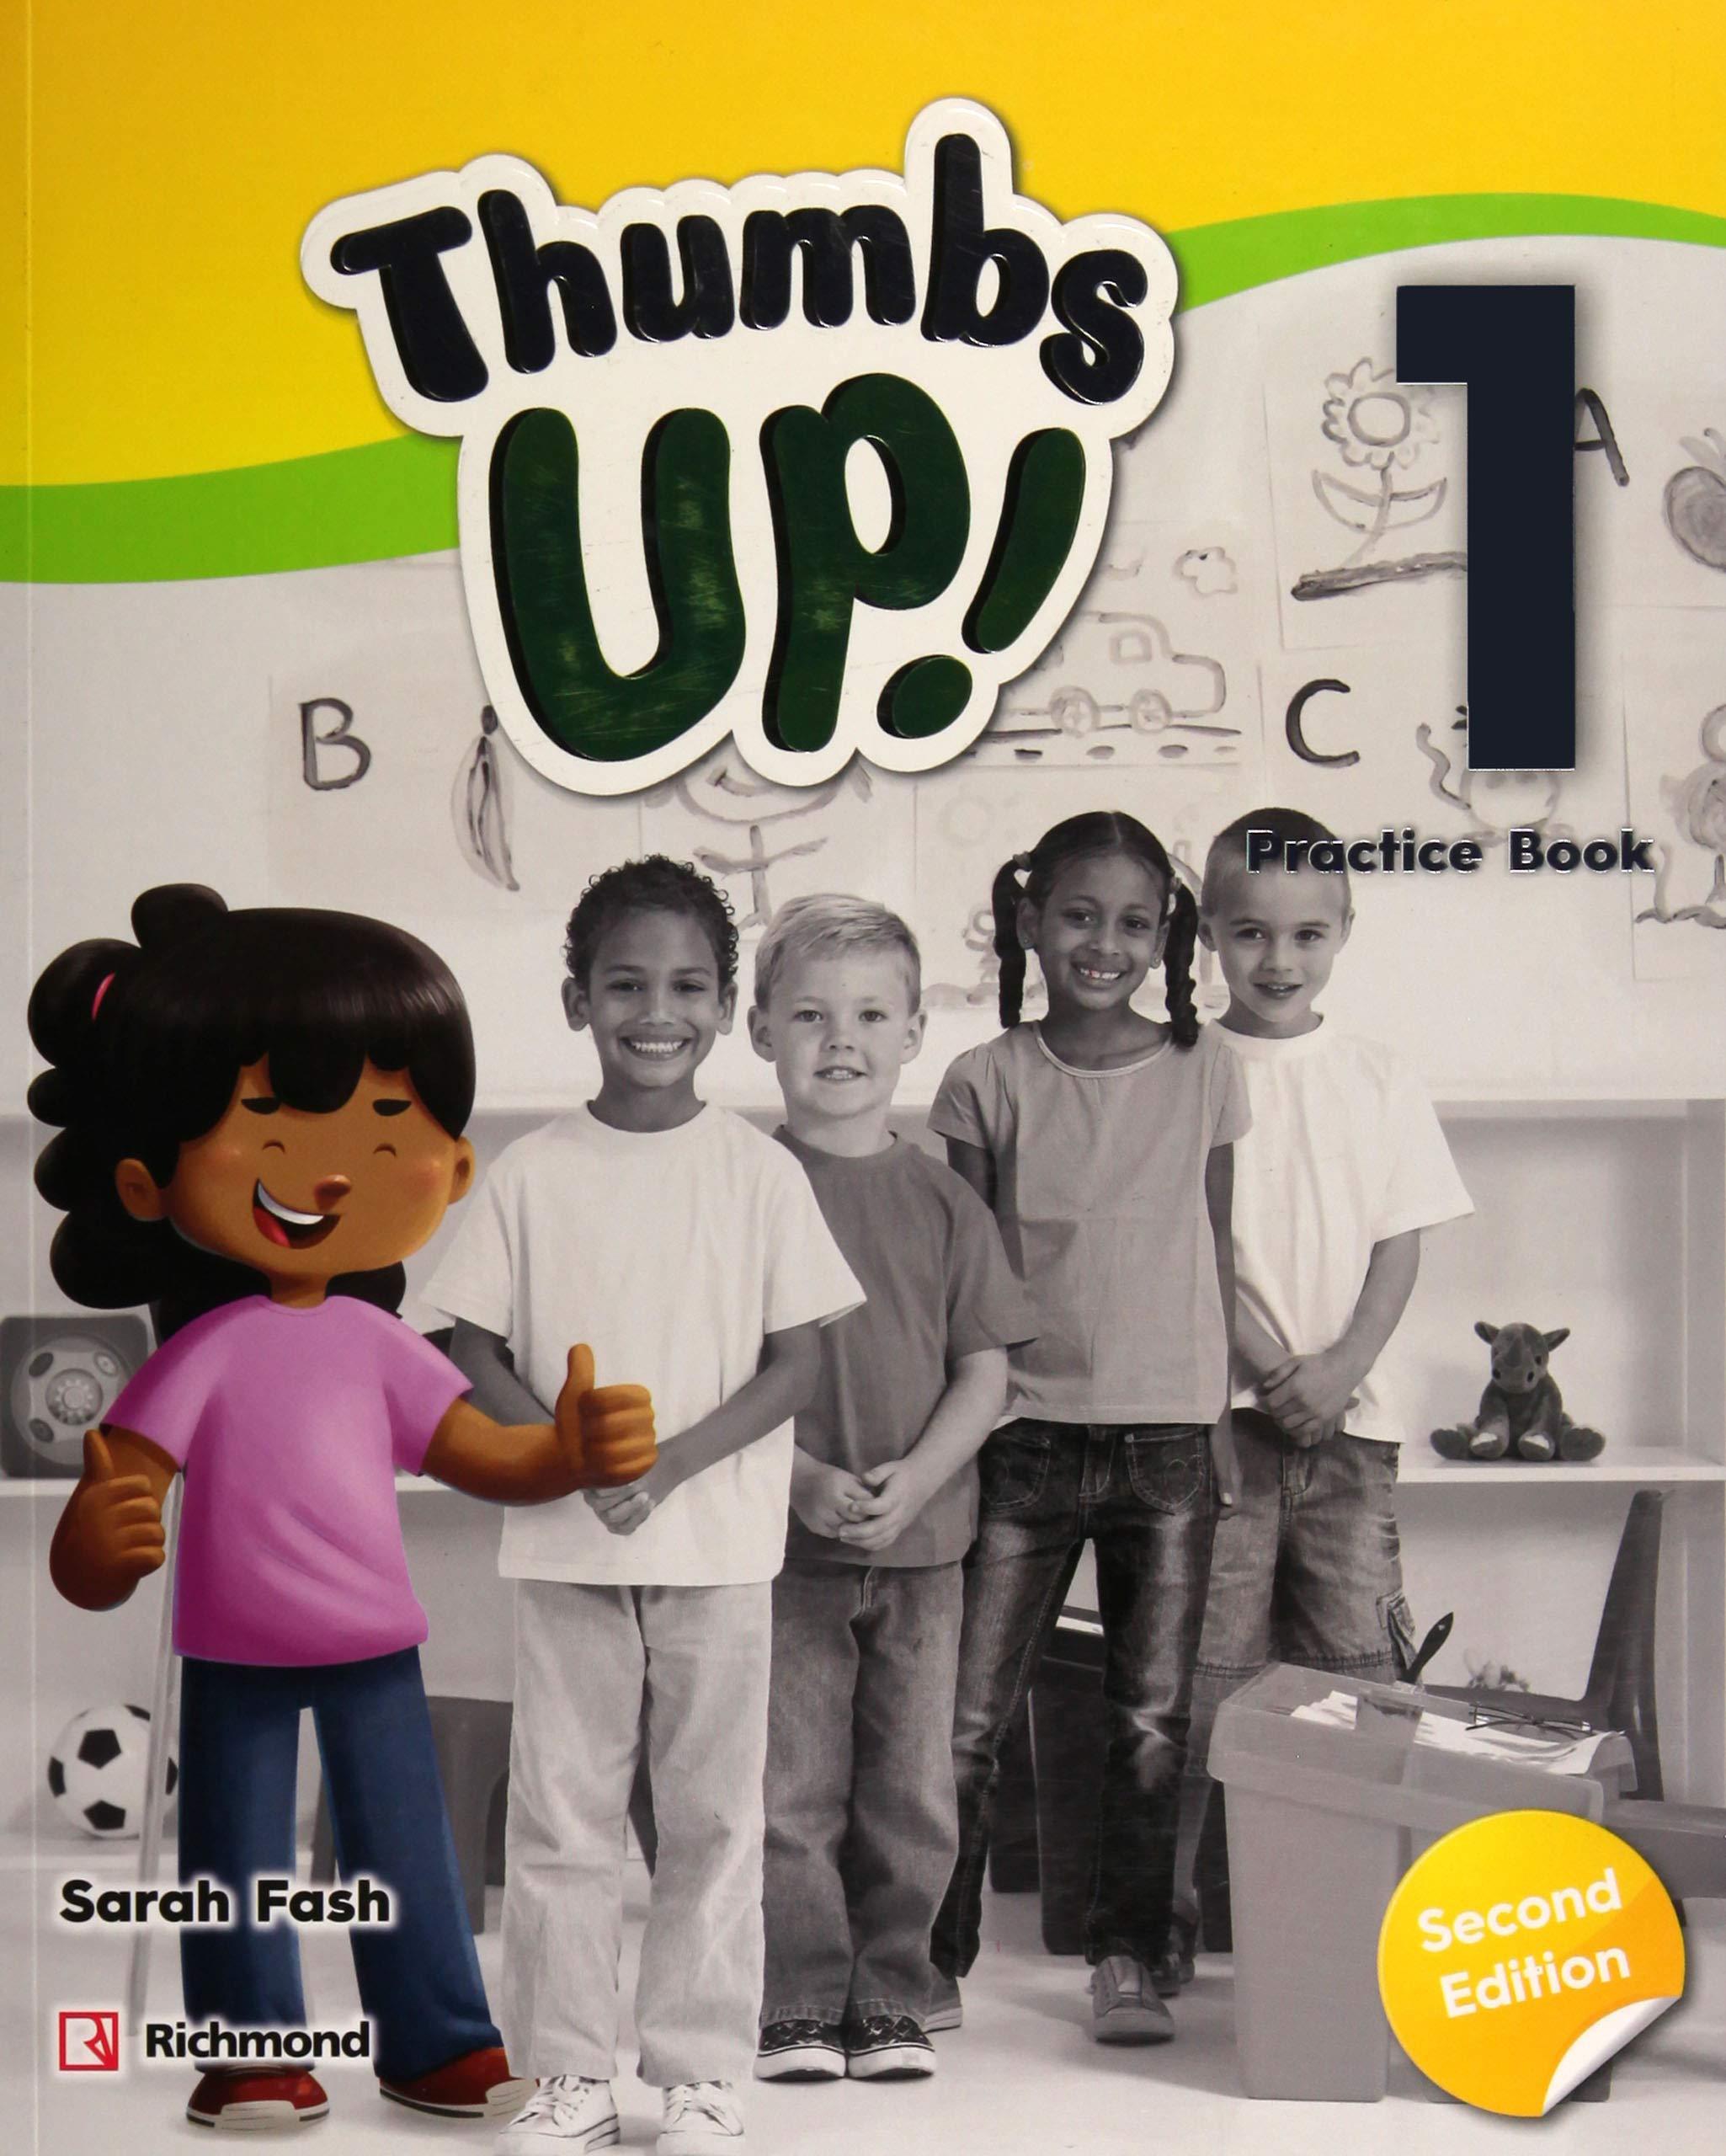 Thumbs Up 1 Practice Book 2 Ed Richmond Publishing Infantil 9786070613913 Amazon Com Books We have no control over the content of these pages. thumbs up 1 practice book 2 ed